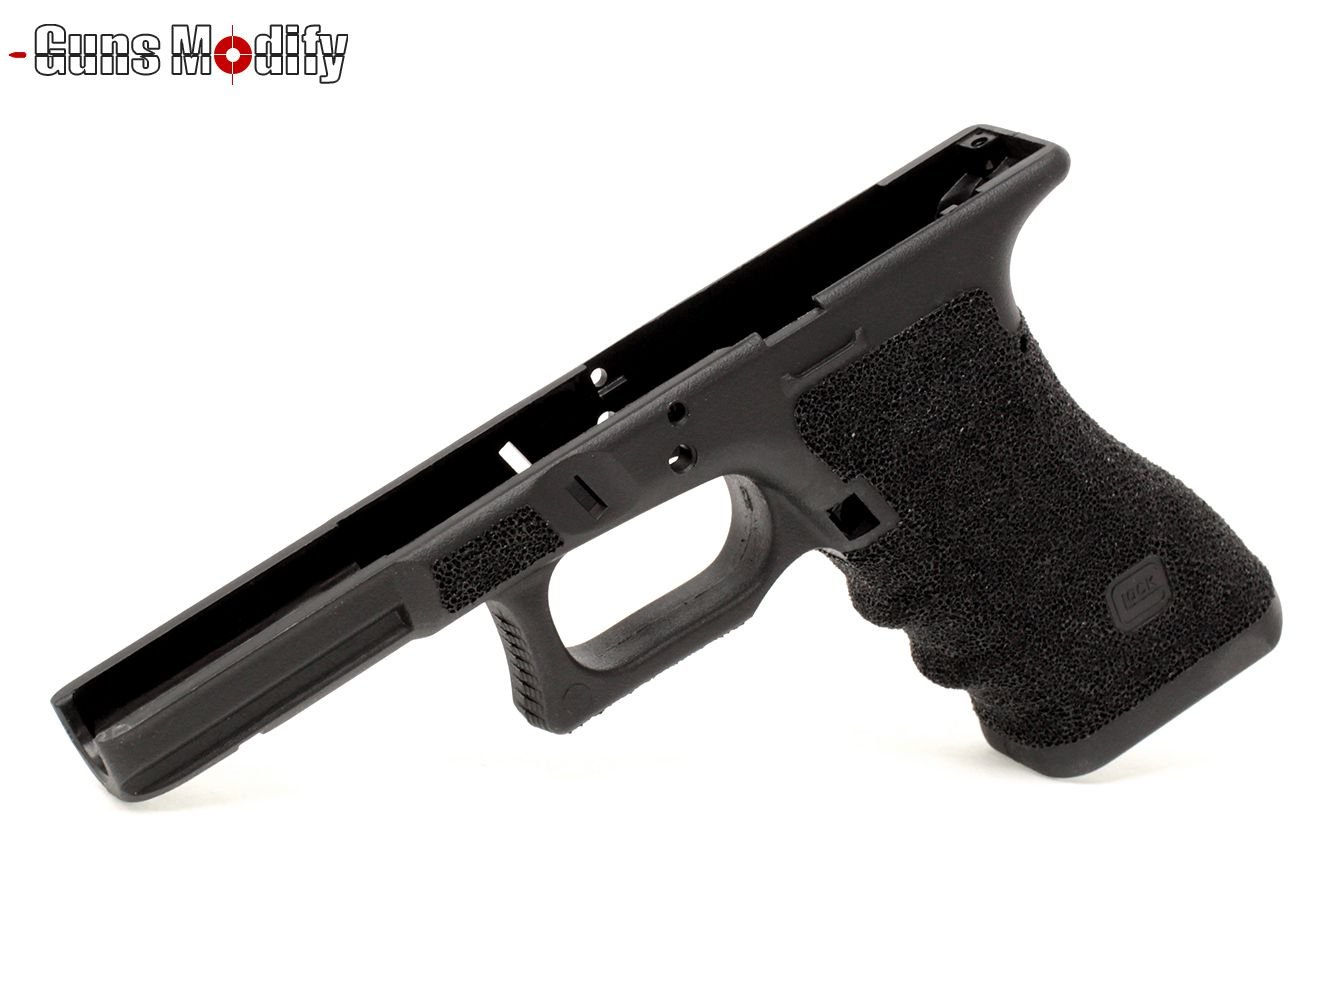 Guns Modify Gen3 ポリマー樹脂+ファイバー Tスタイル CNC ステッピングフレーム グロックシリーズ BK B0772HTXL7